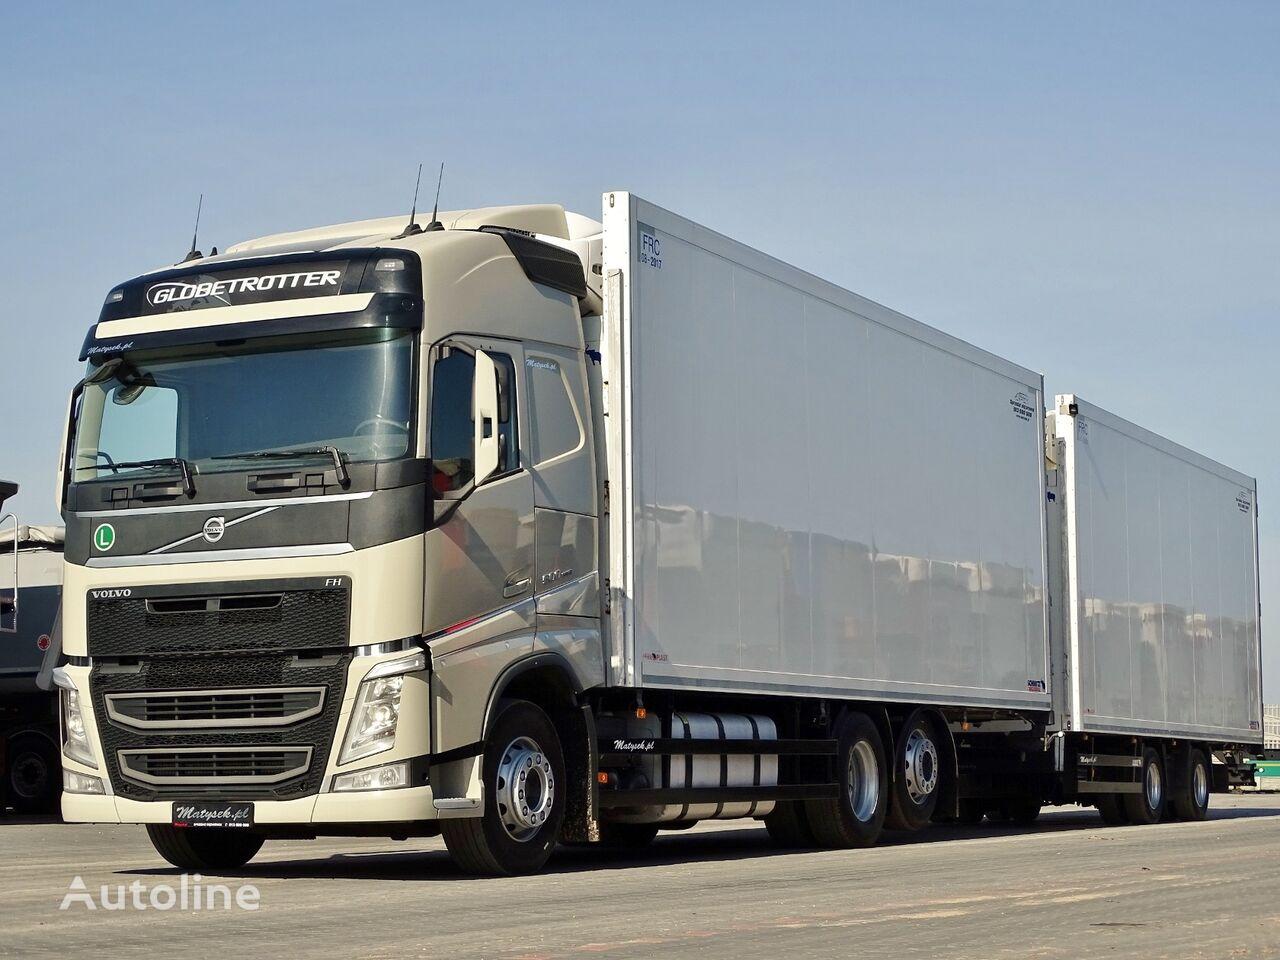 VOLVO FH 500 / 6X2 / REFRIDGERATOR / THERMO KING T800R + SCHMITZ TRAIL refrigerated truck + refrigerated trailer